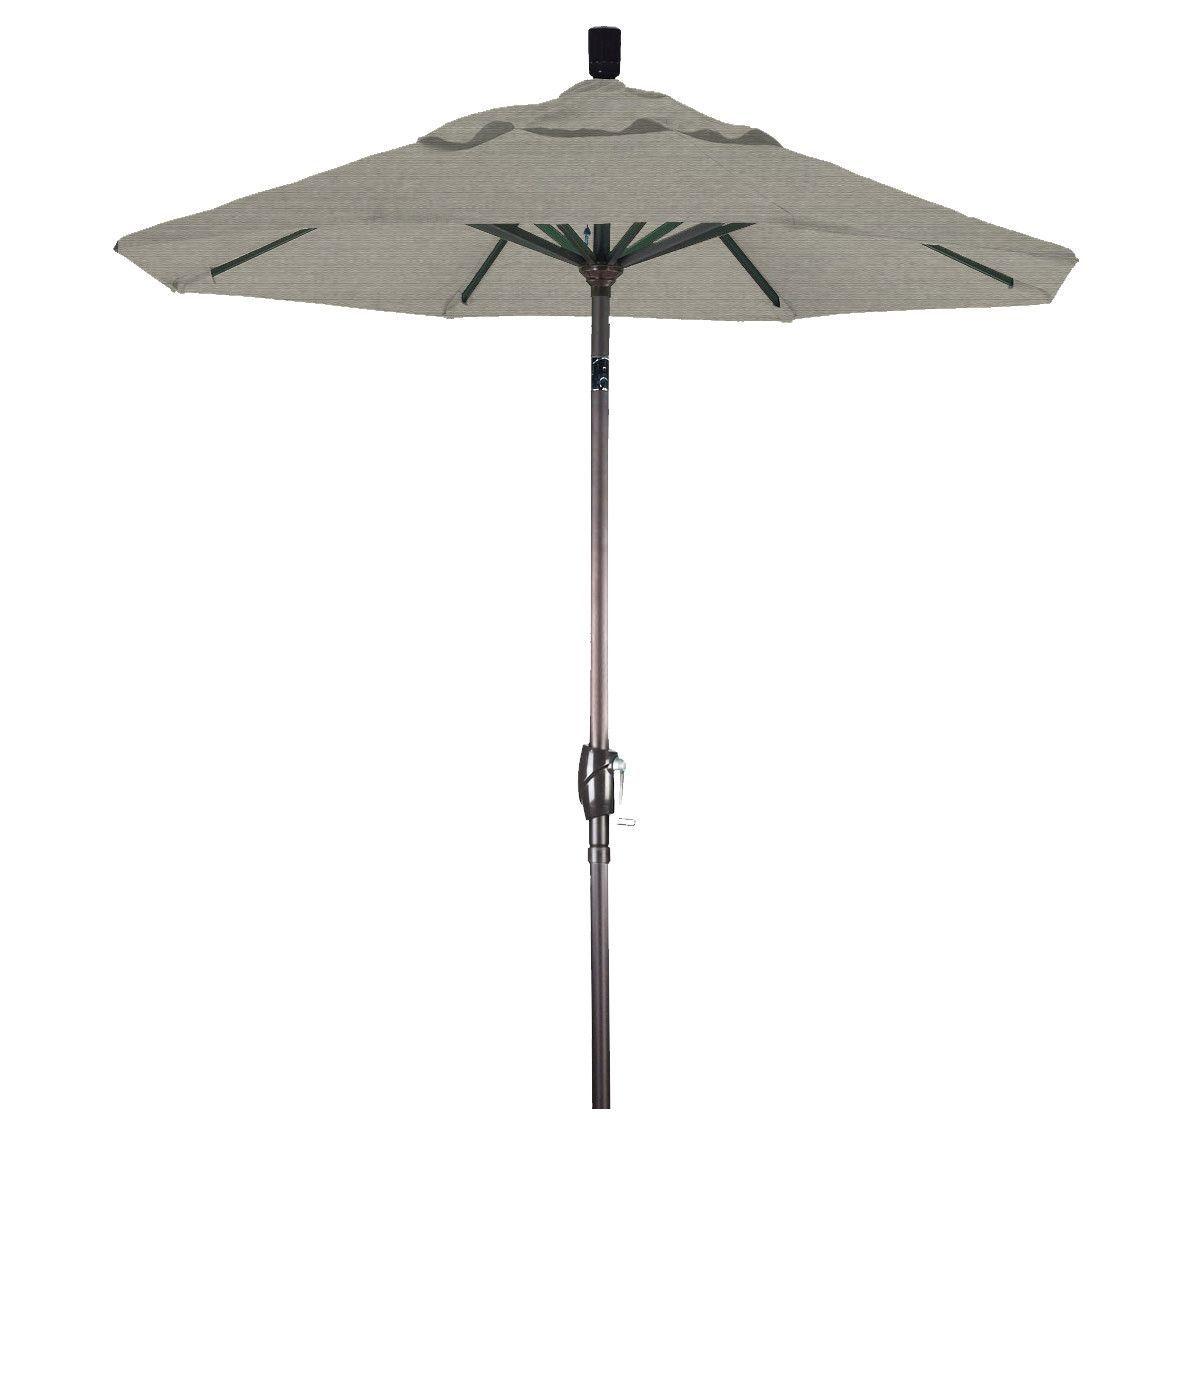 Eclipse Collection 6' Aluminum Market Umbrella Push Tilt Bronze/Sunbrella/Spectrum Dove